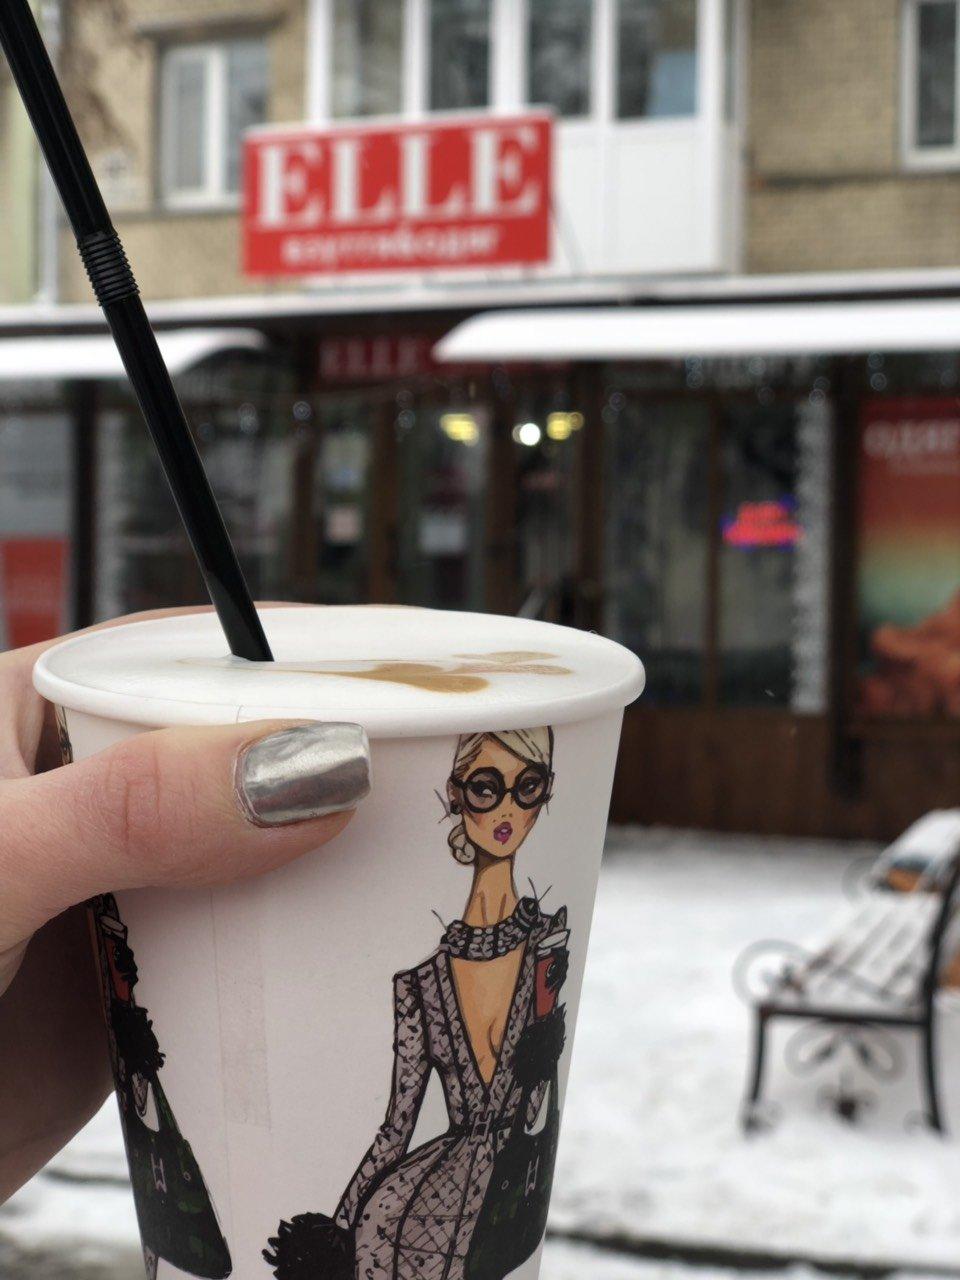 Кохання з присмаком кави: де у Хмельницькому провести День закоханих, фото-20